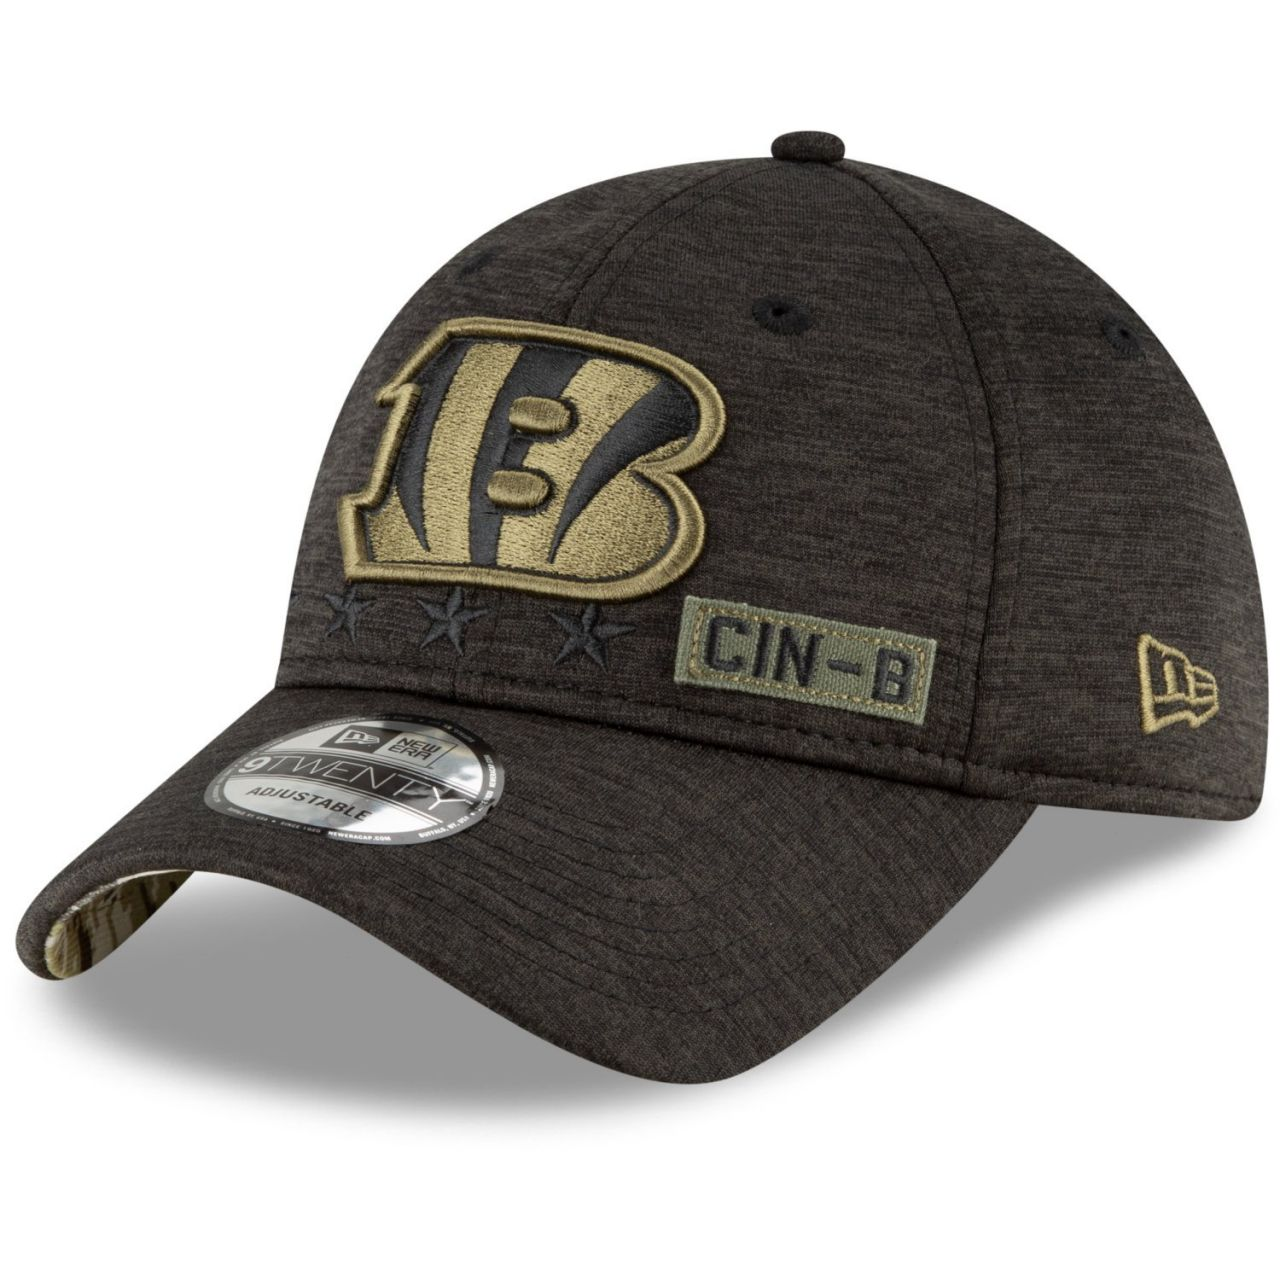 amfoo - New Era 9TWENTY Cap Salute to Service Cincinnati Bengals